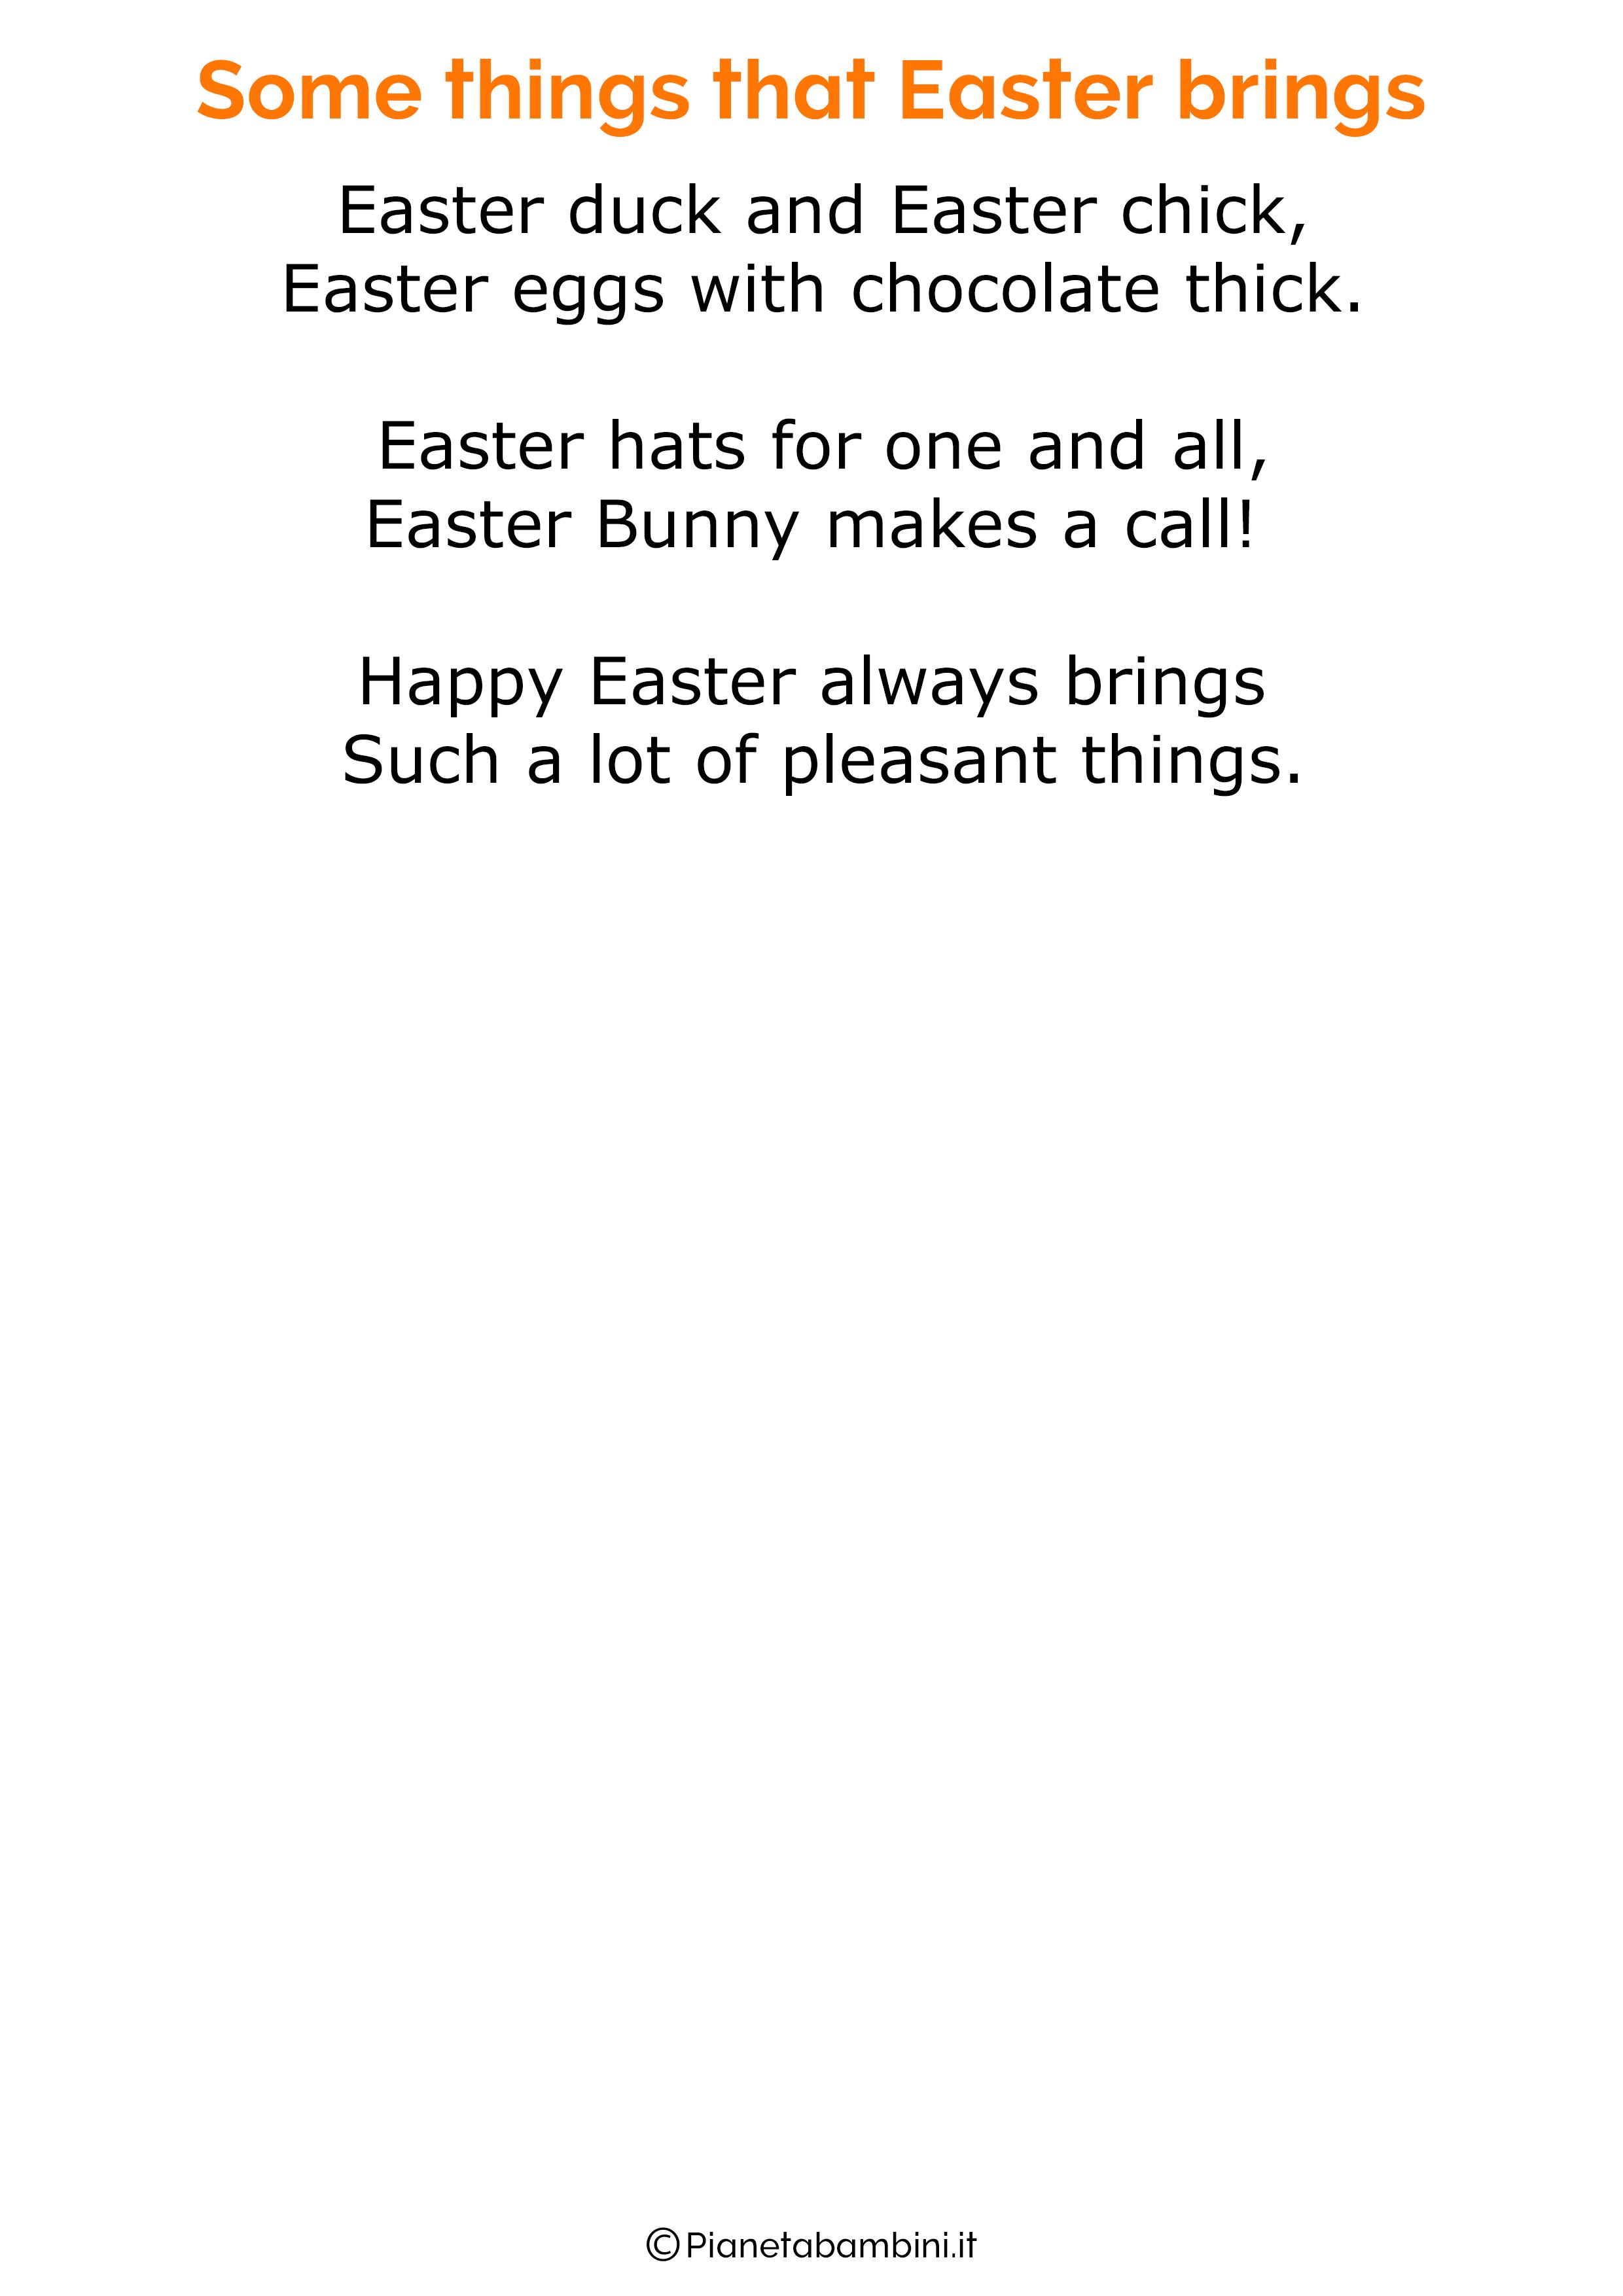 Poesie di Pasqua in inglese per bambini 08